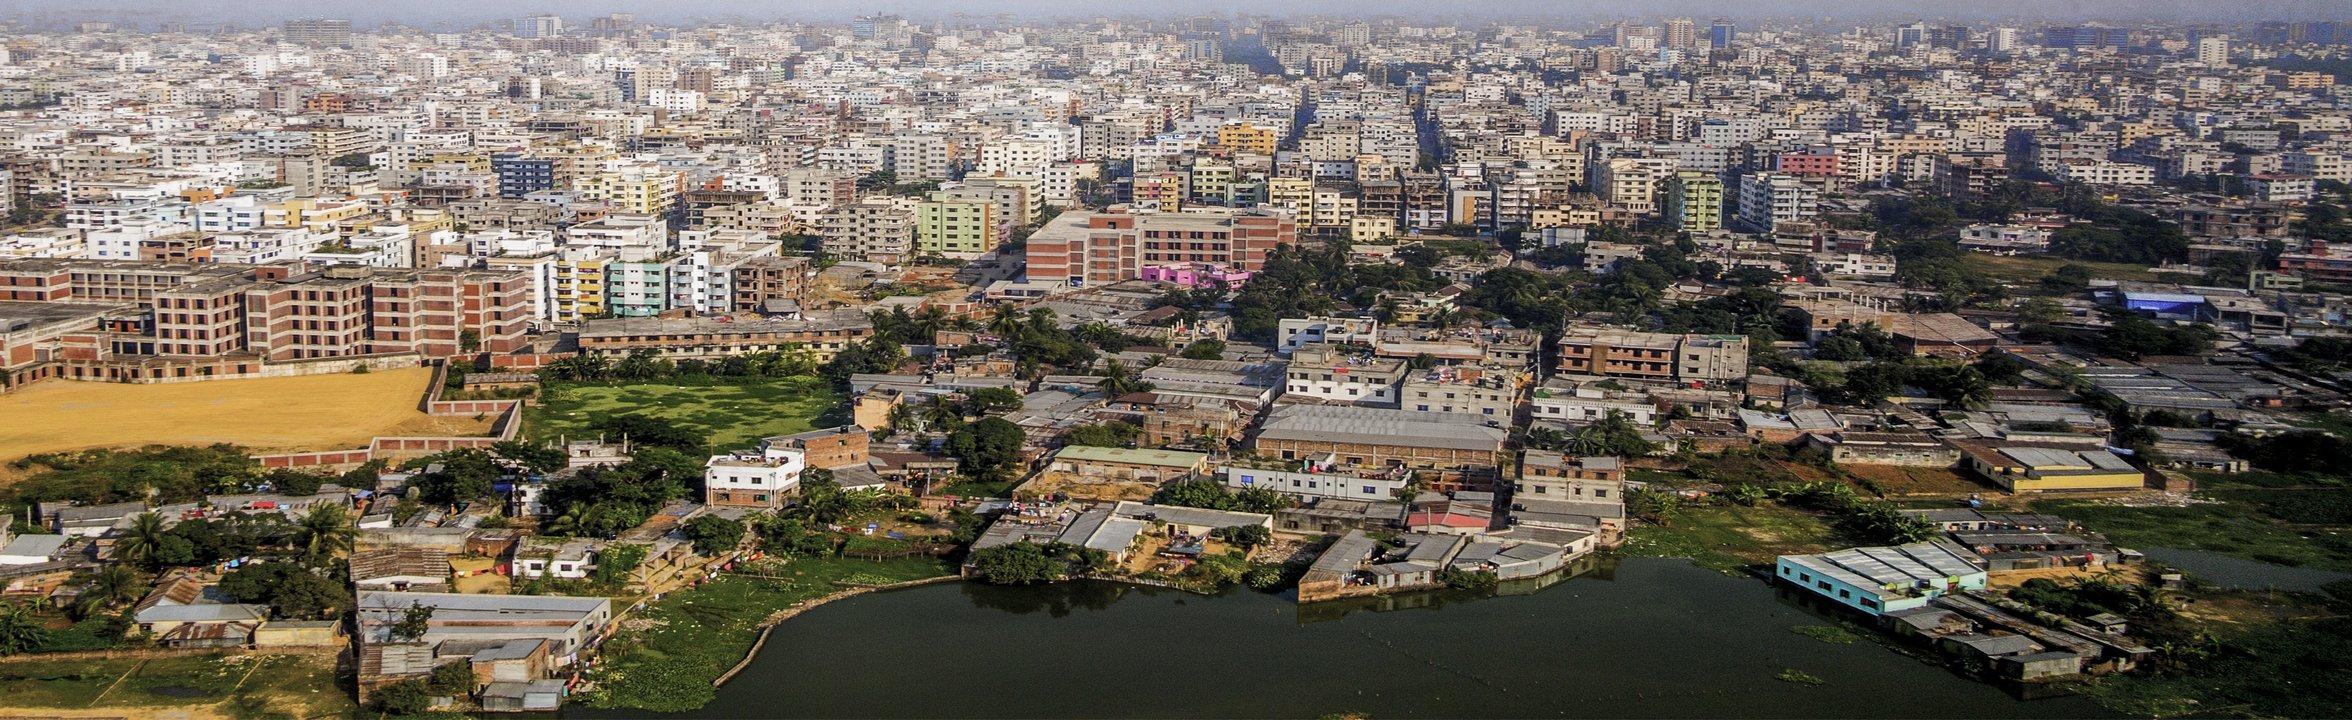 Bangladesh Office Image